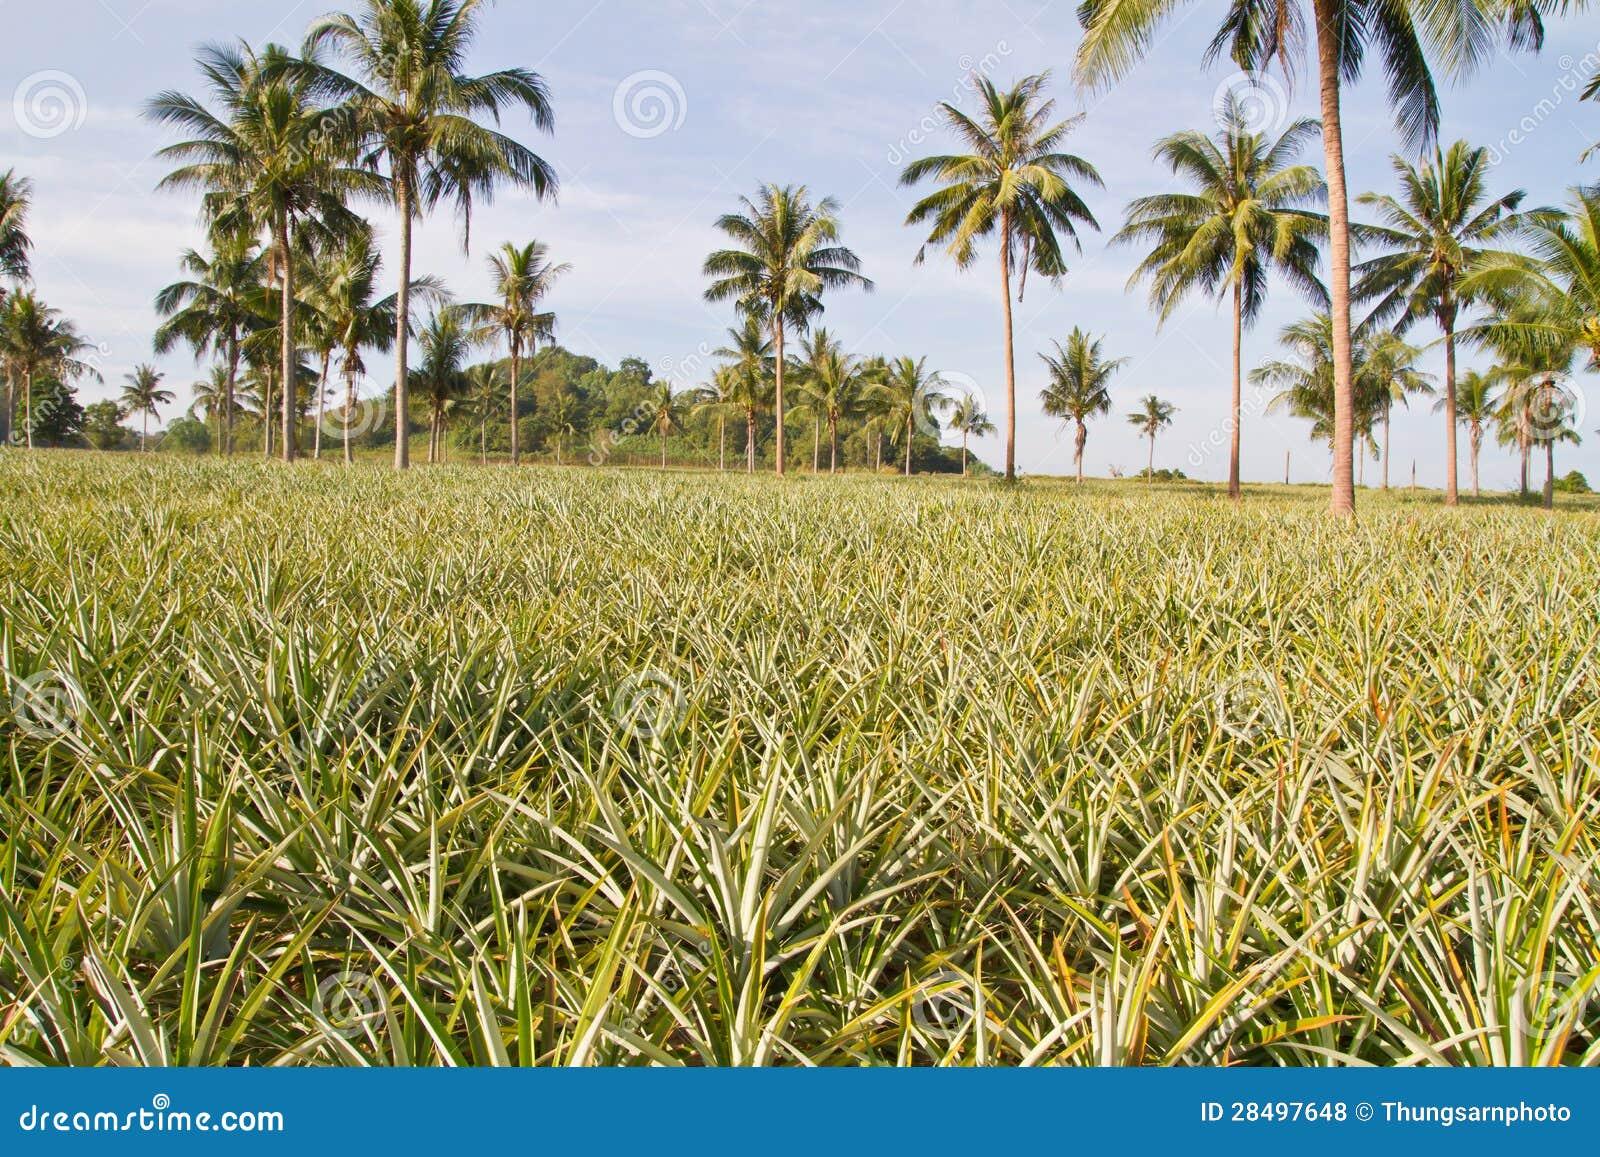 Pineapple Plant Farm Stock Photo Image Of Freshness